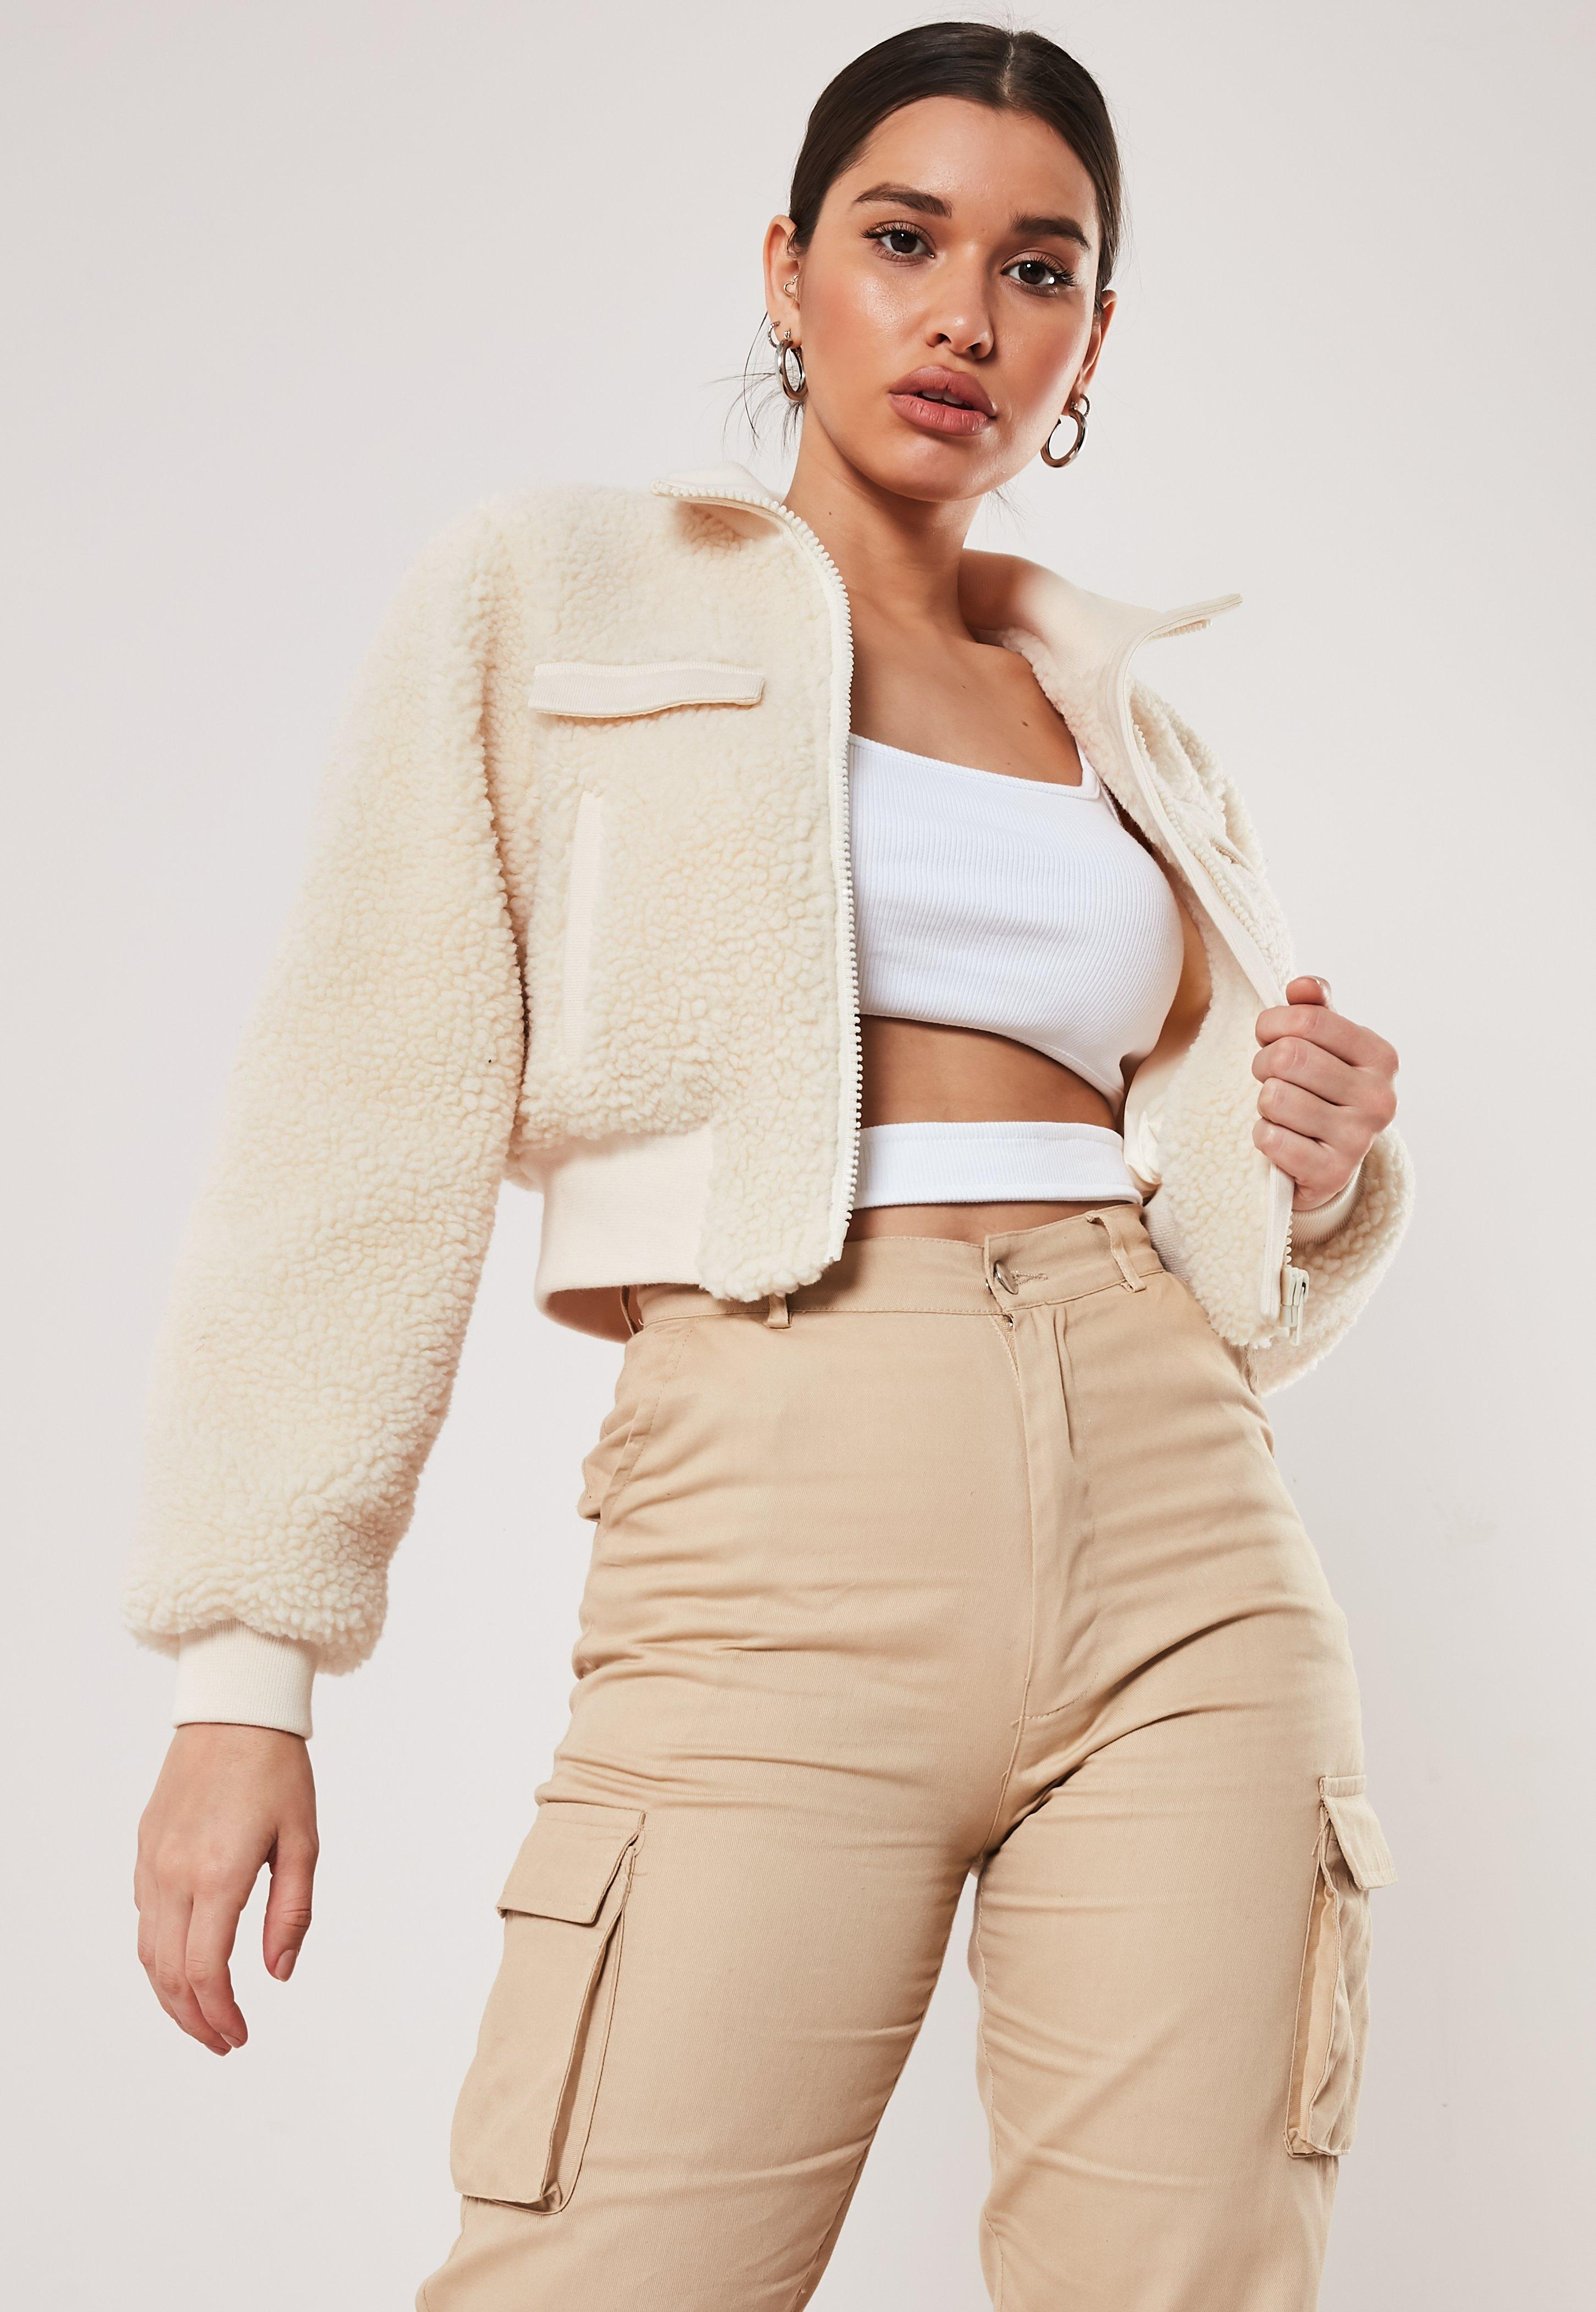 9daeaf7b33882 Coats & Jackets for Women - Missguided Australia